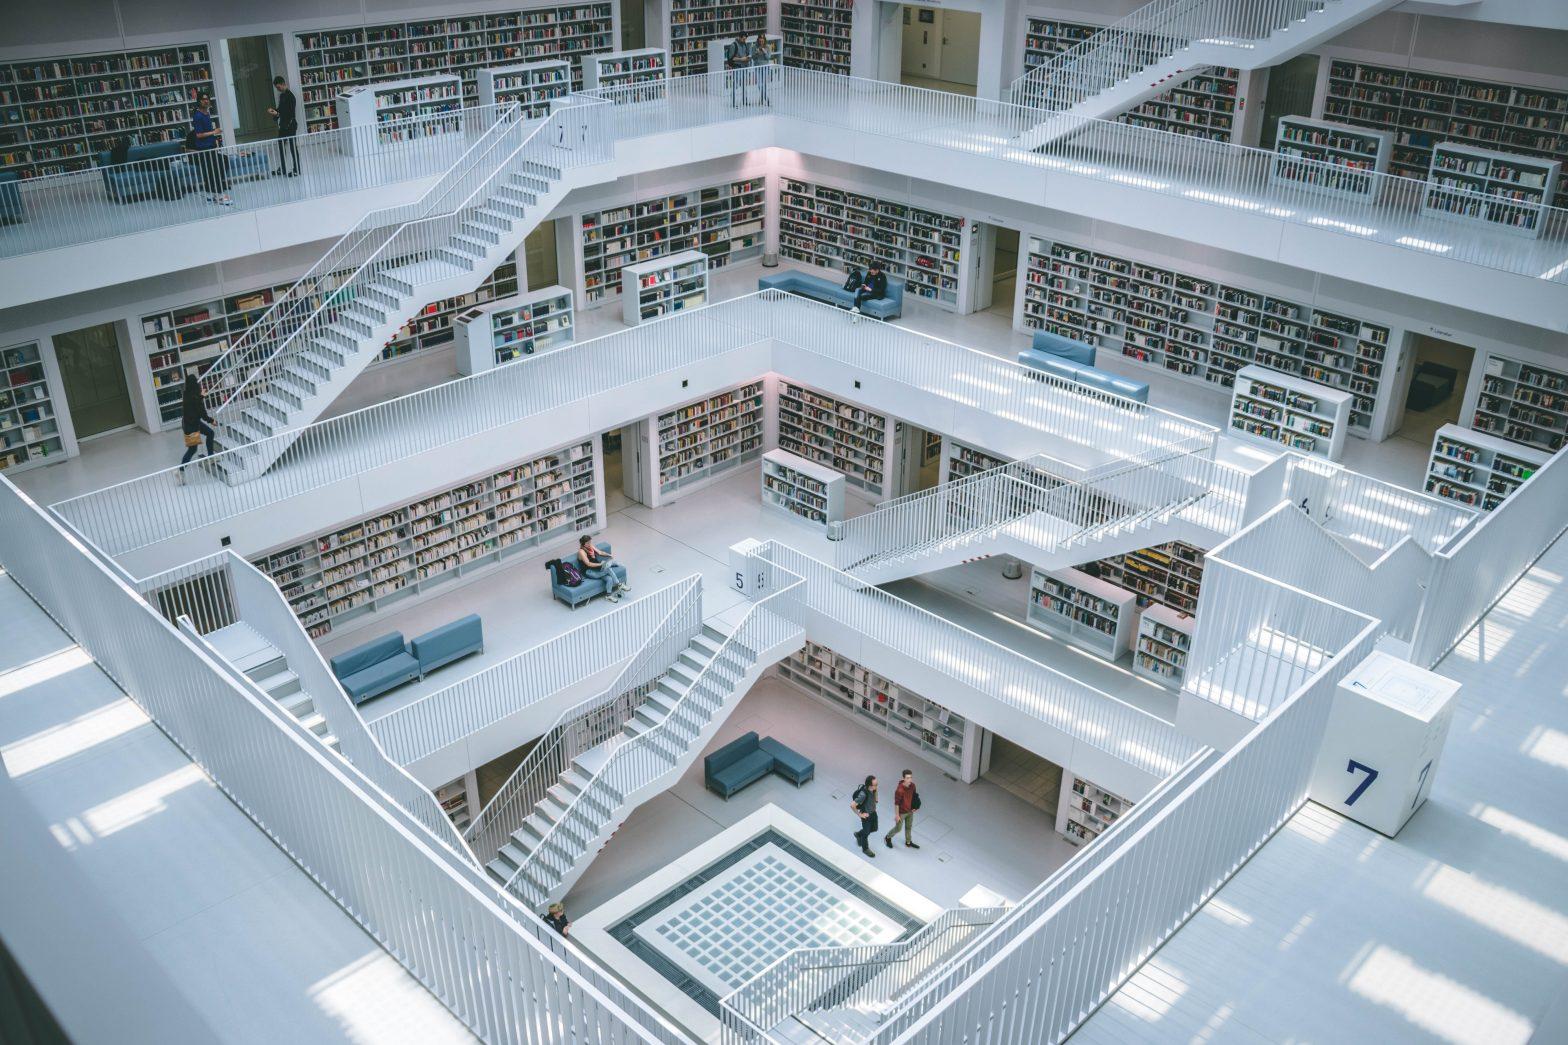 Kulturgeschichtliche Bibliotheken